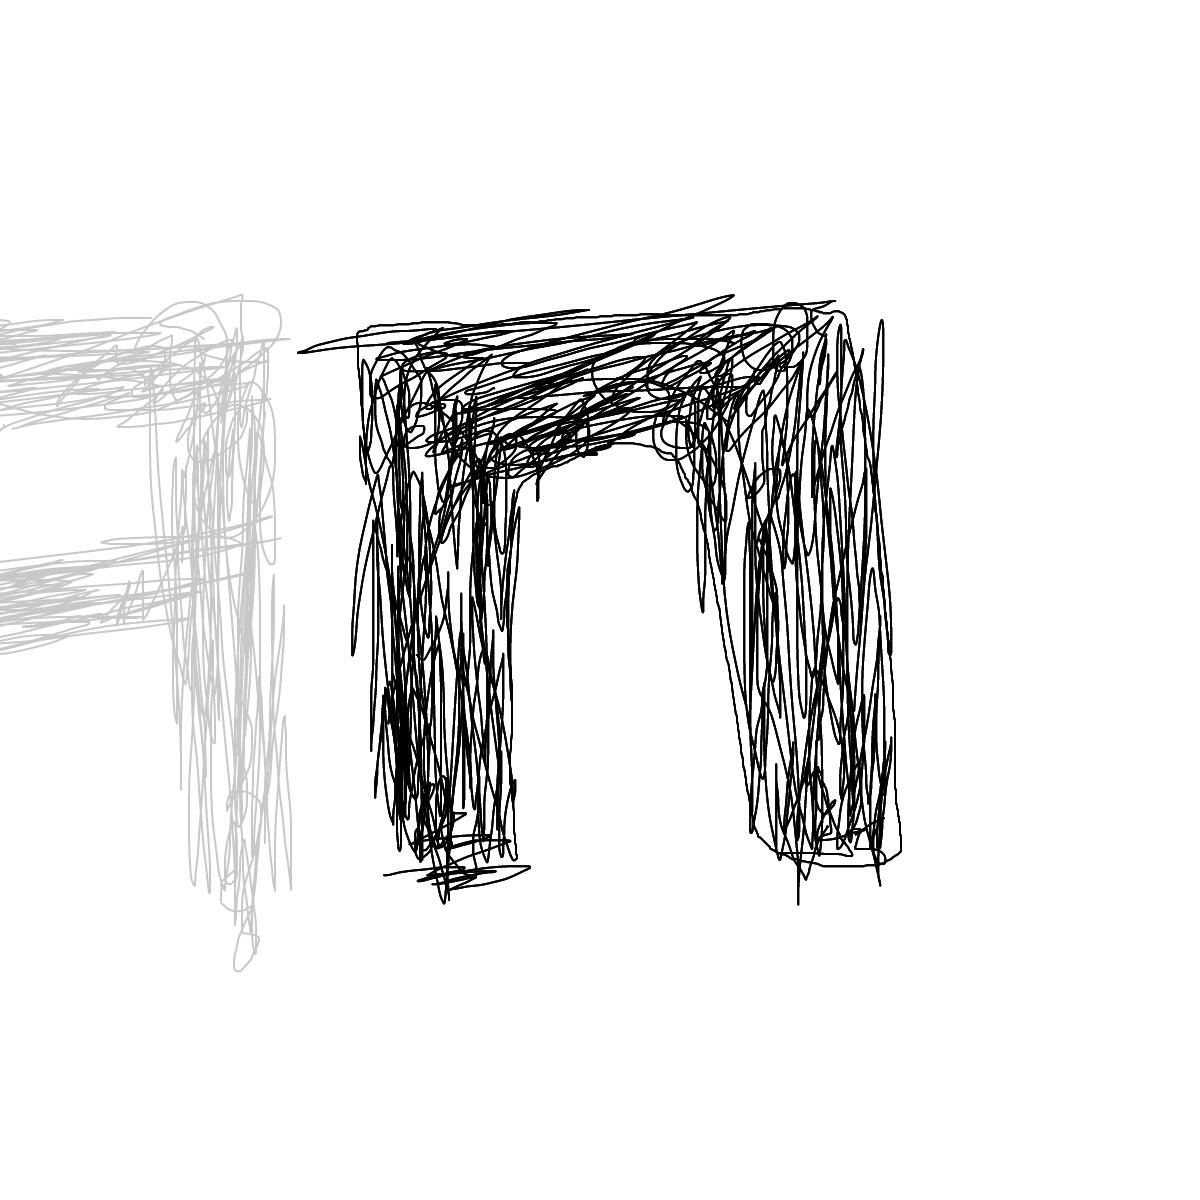 BAAAM drawing#17667 lat:49.2999954223632800lng: -122.7785720825195300